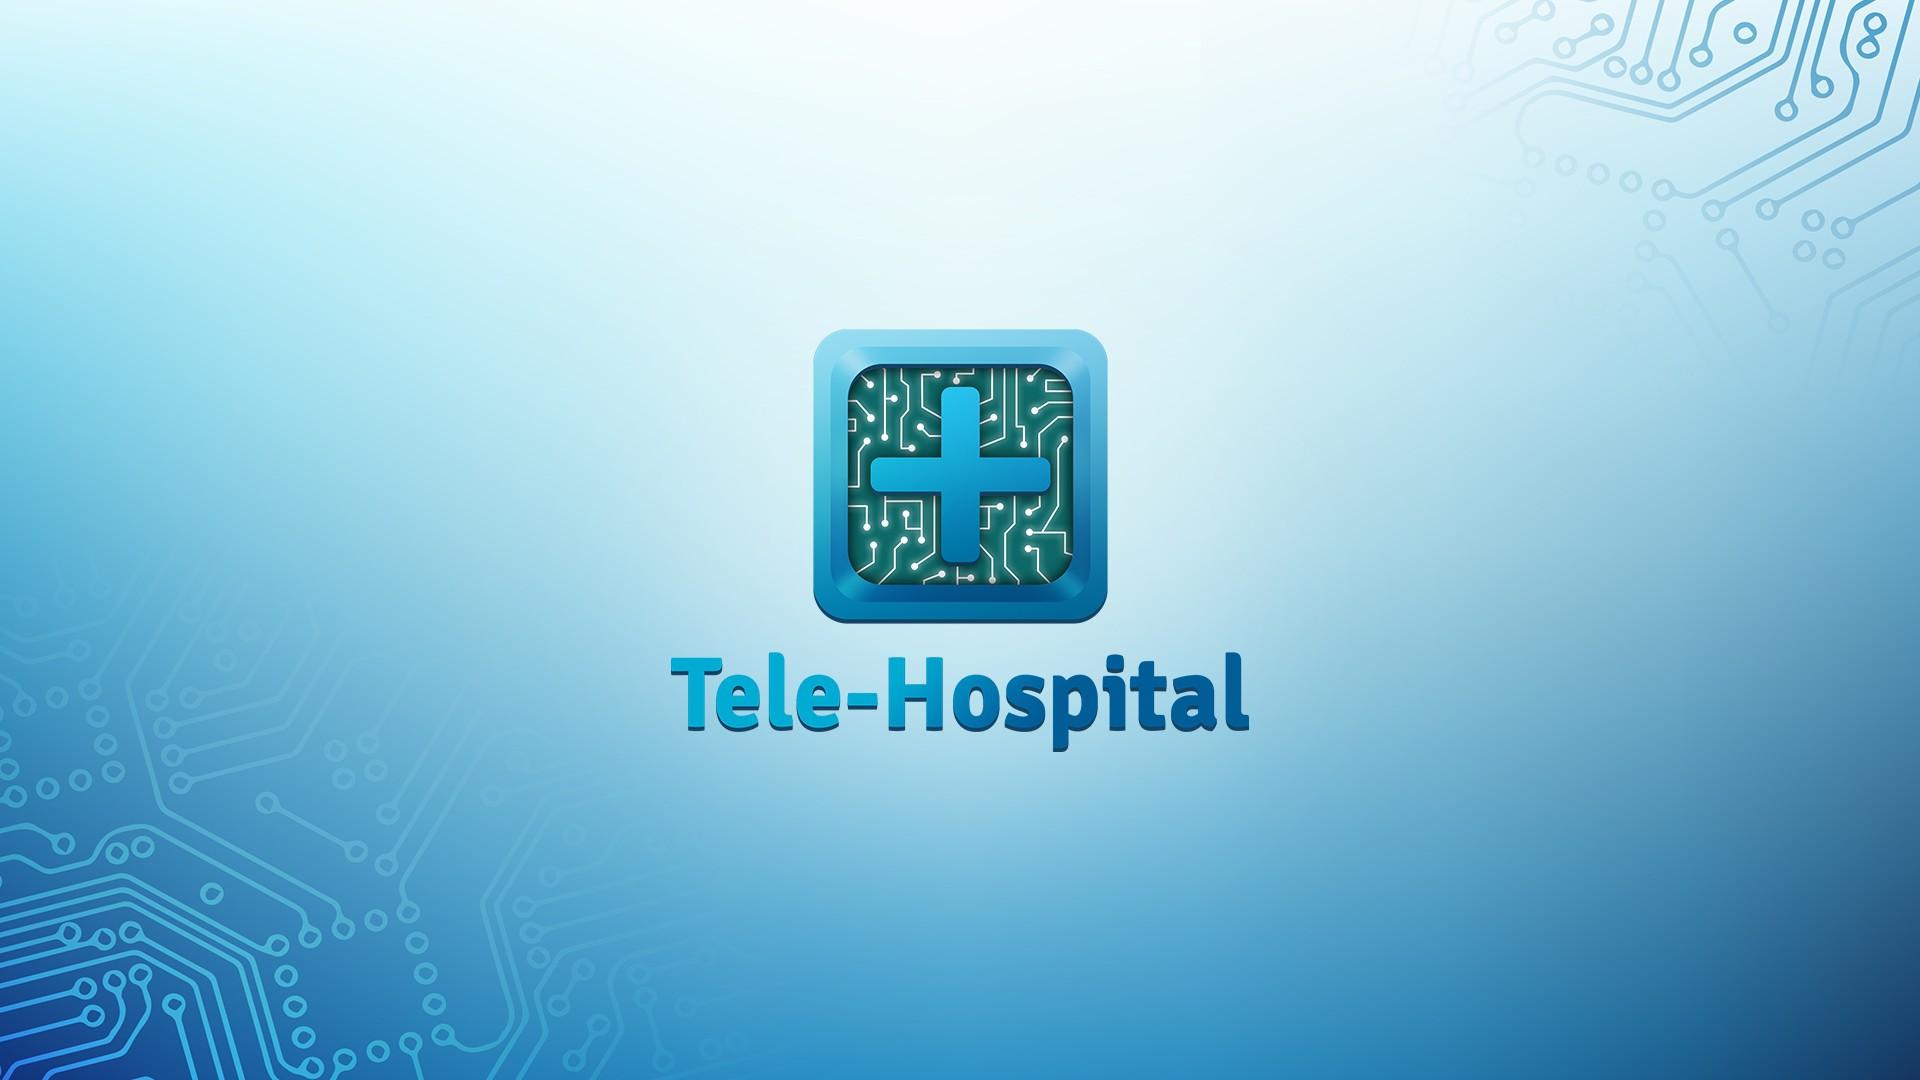 logo tele-hospital sur fond bleu